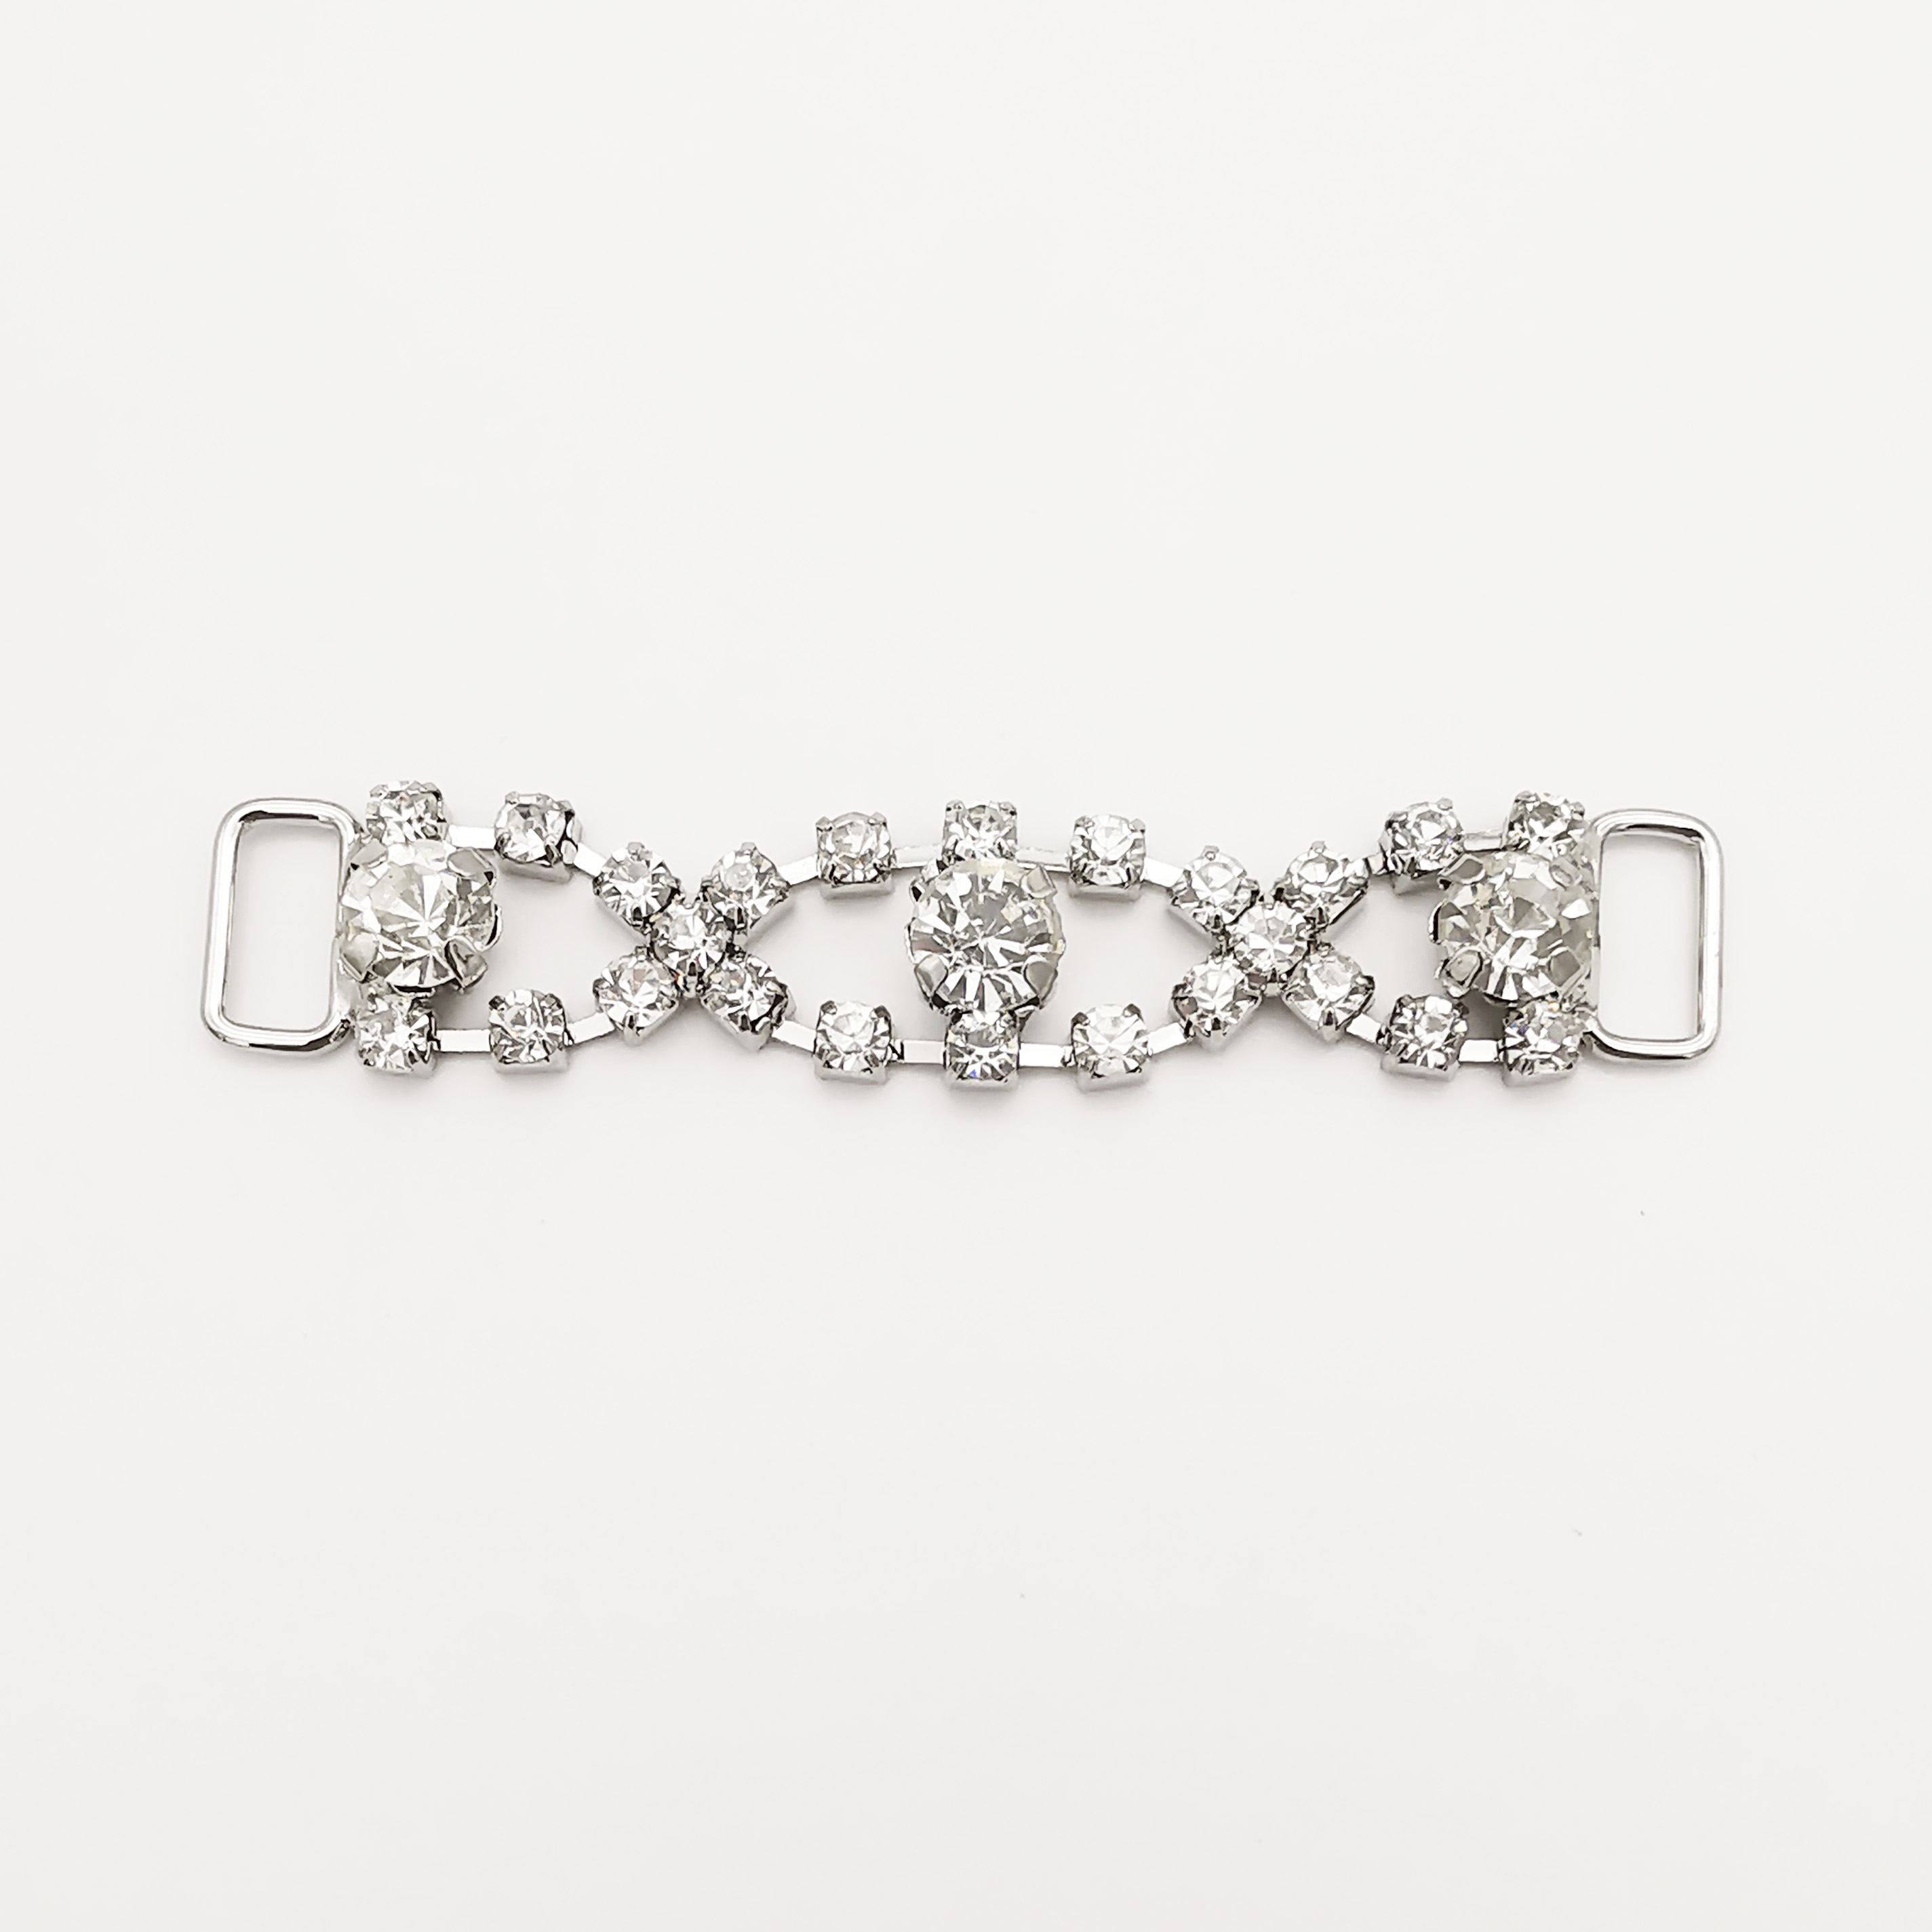 decorative  shoe  chain with nagina diamond stone trim